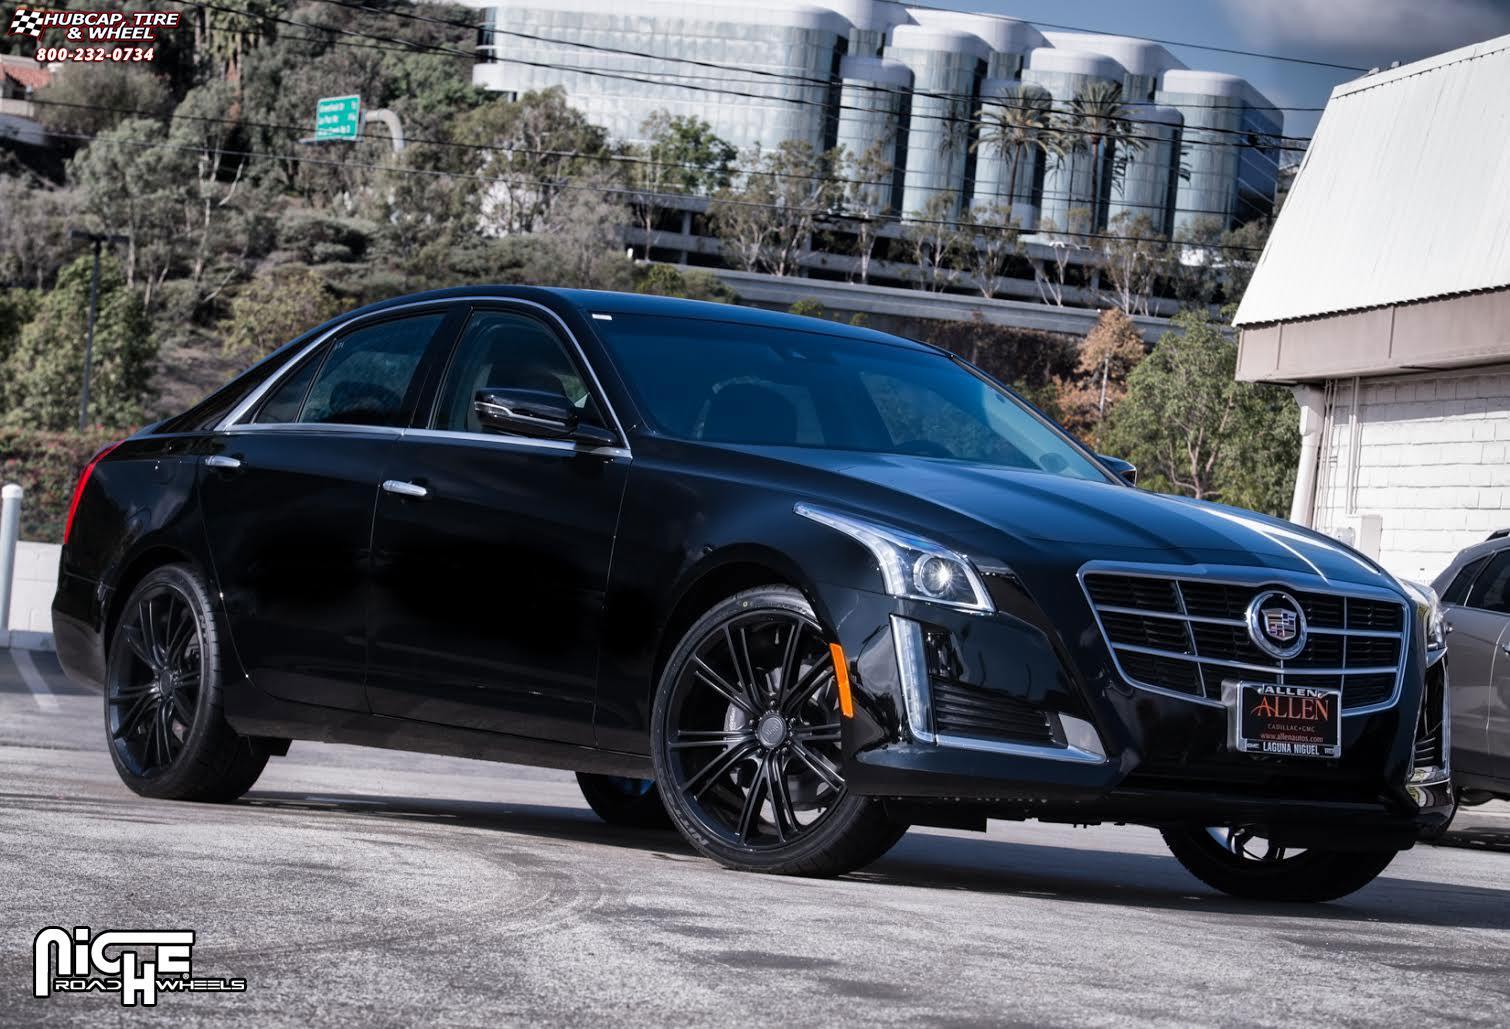 Cadillac Cts Niche Ritz M144 Wheels Satin Black